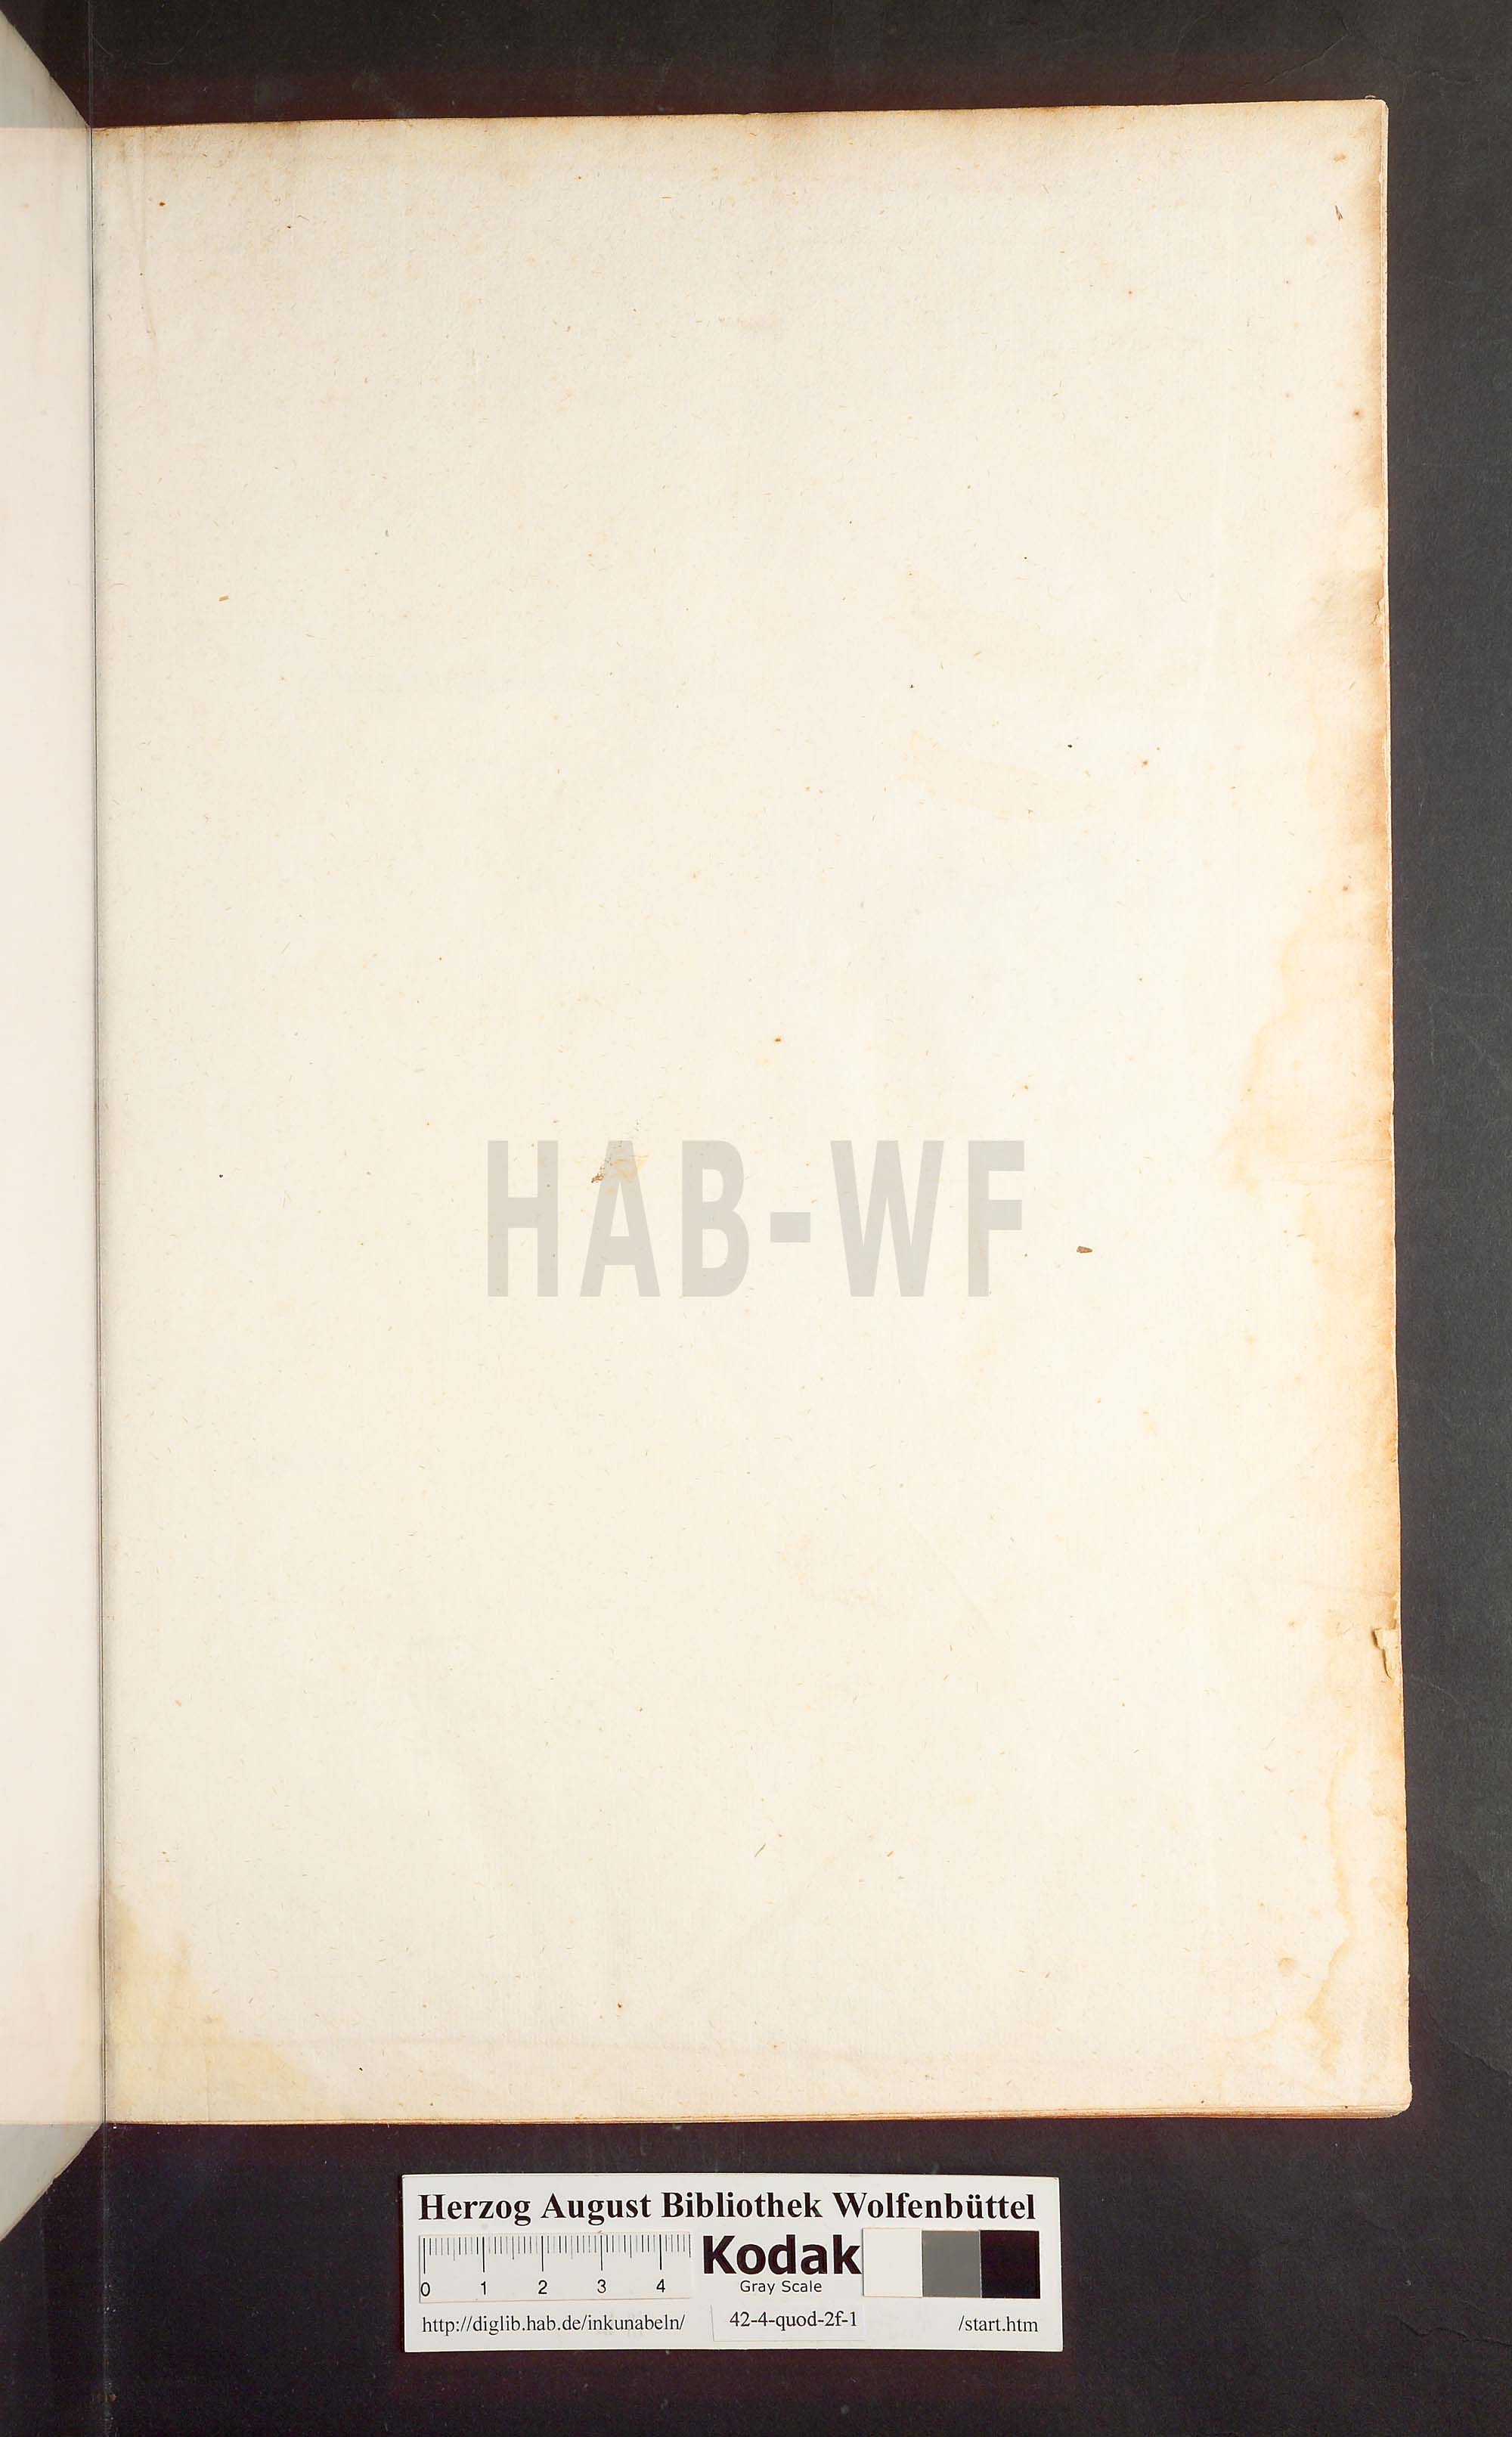 https://diglib.hab.de/inkunabeln/42-4-quod-2f-1/max/00001.jpg